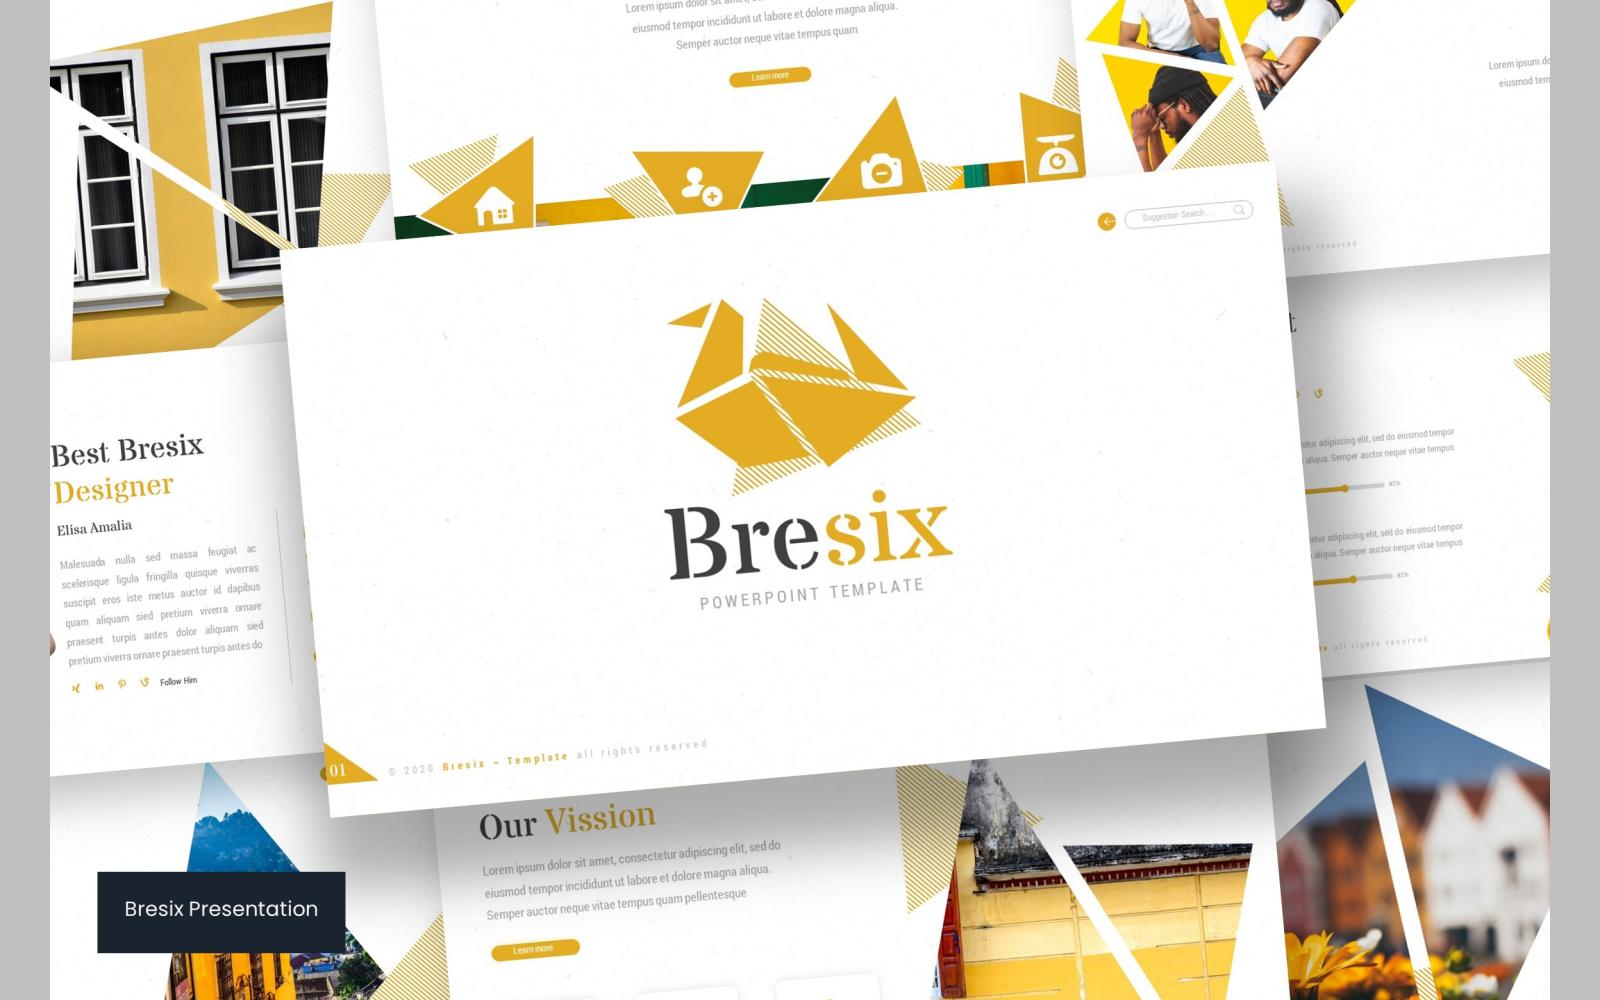 Bresix PowerPoint Template